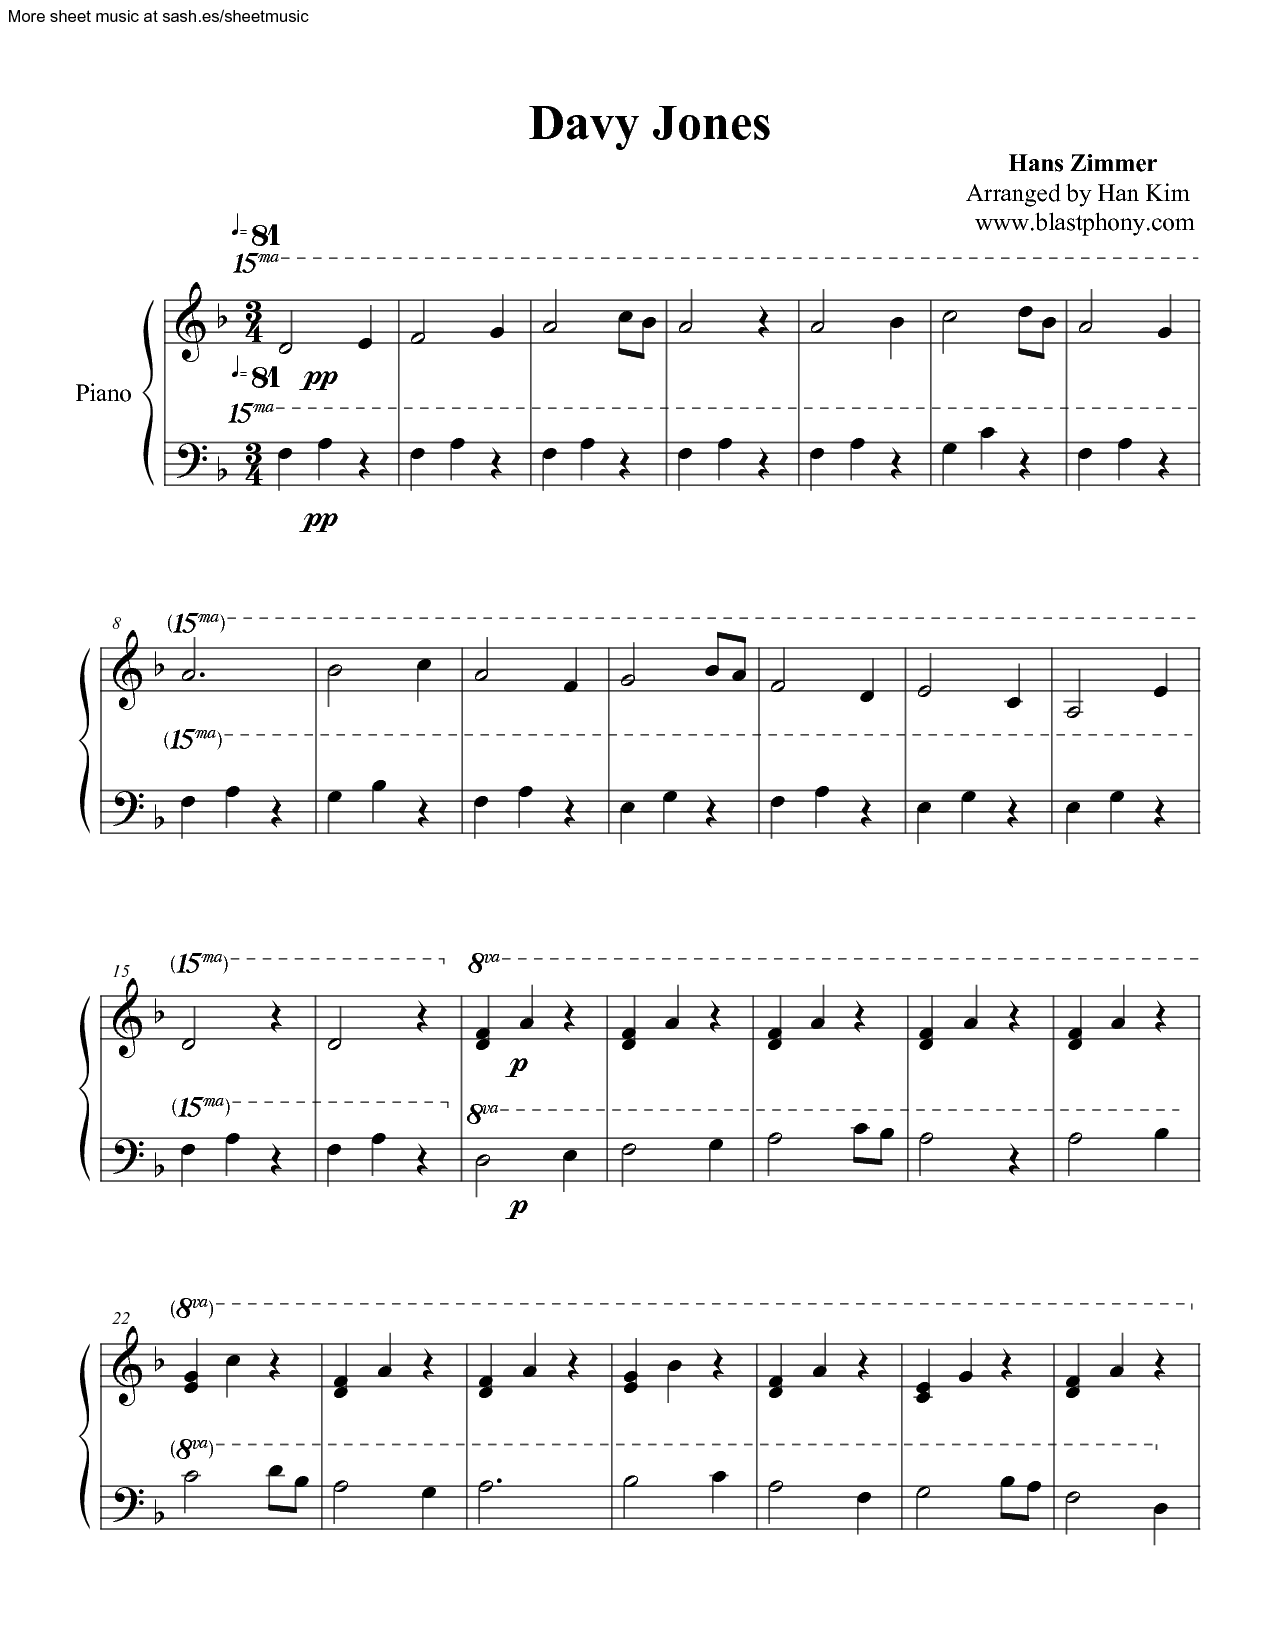 Pirates Of The Caribbean - Davy Jones sheet music